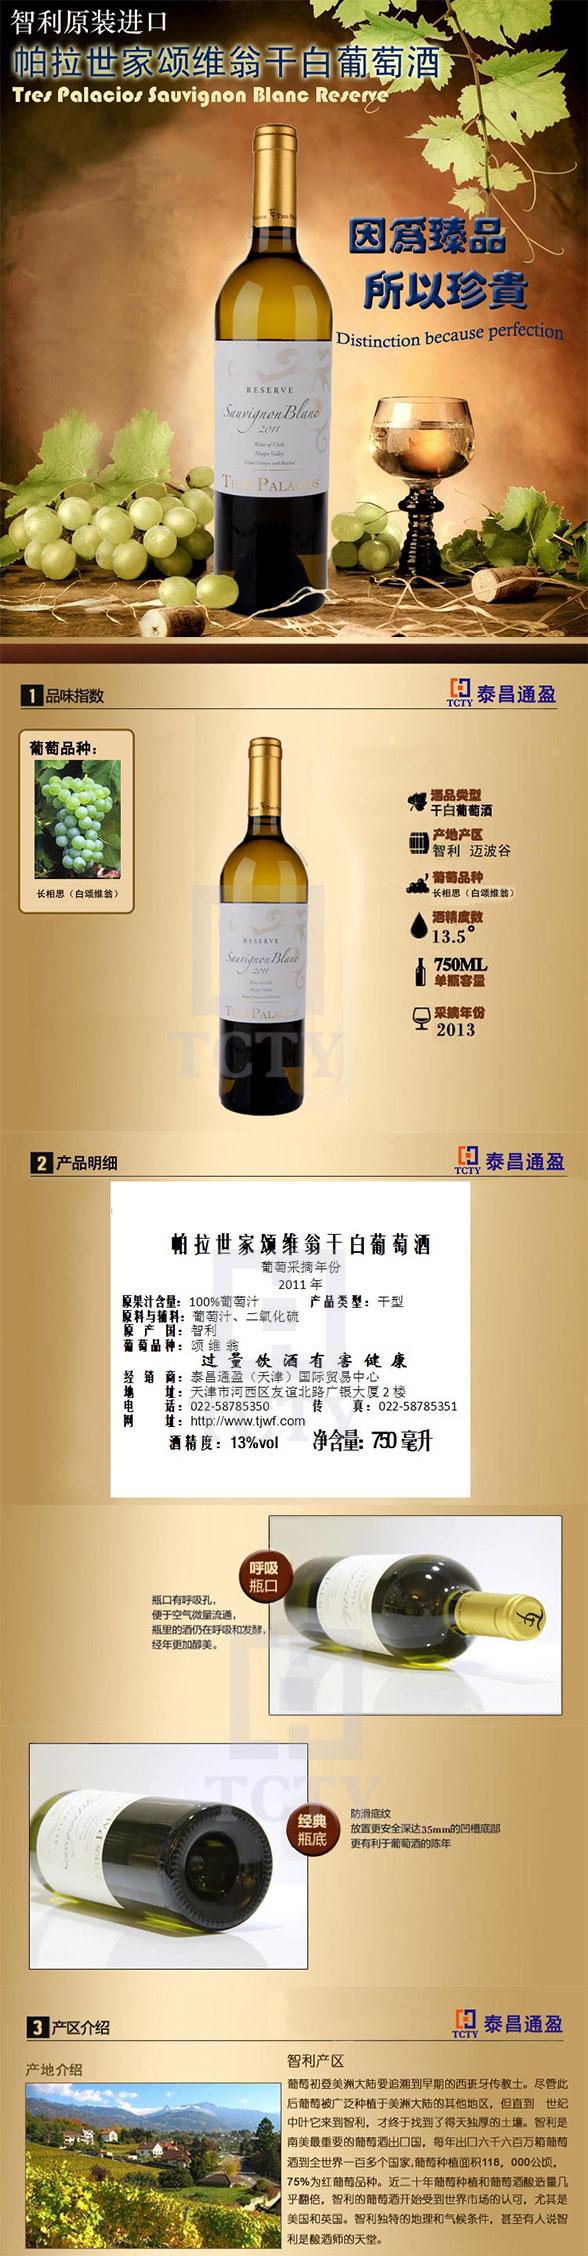 Tres Palacios Sauvignon Blanc Reserve 帕拉世家颂维翁干白葡萄酒